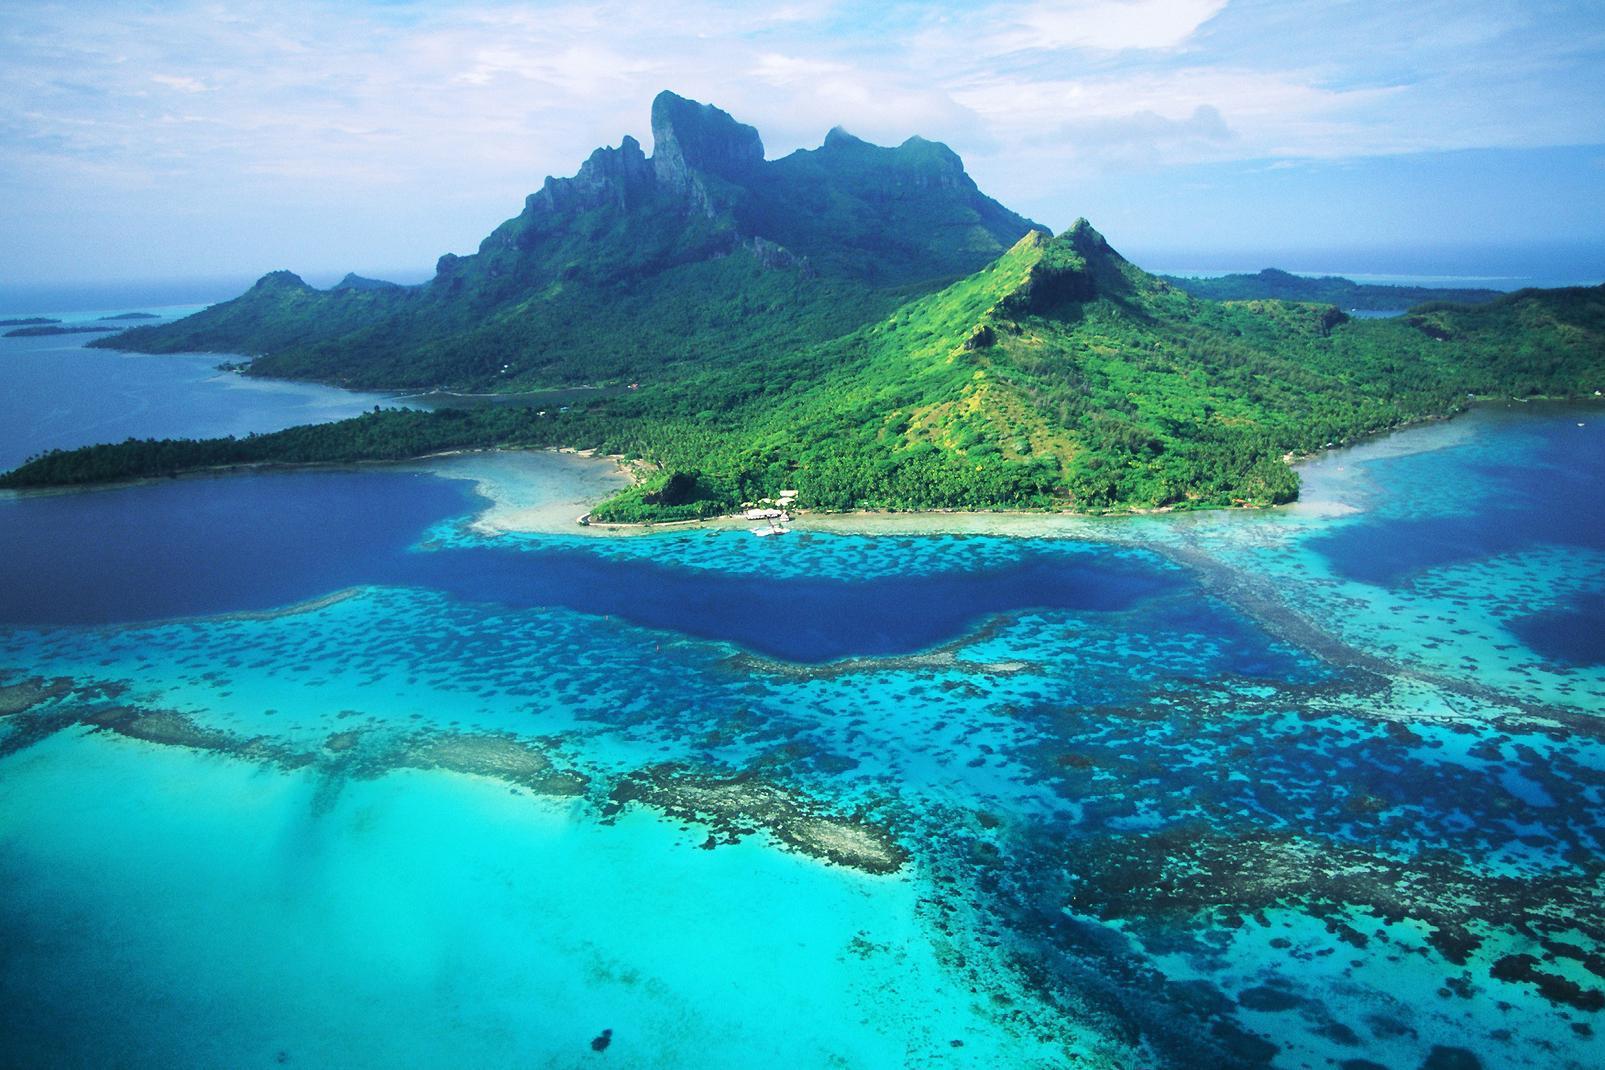 forum voyage tahiti et l 39 archipel de la soci t easyvoyage. Black Bedroom Furniture Sets. Home Design Ideas